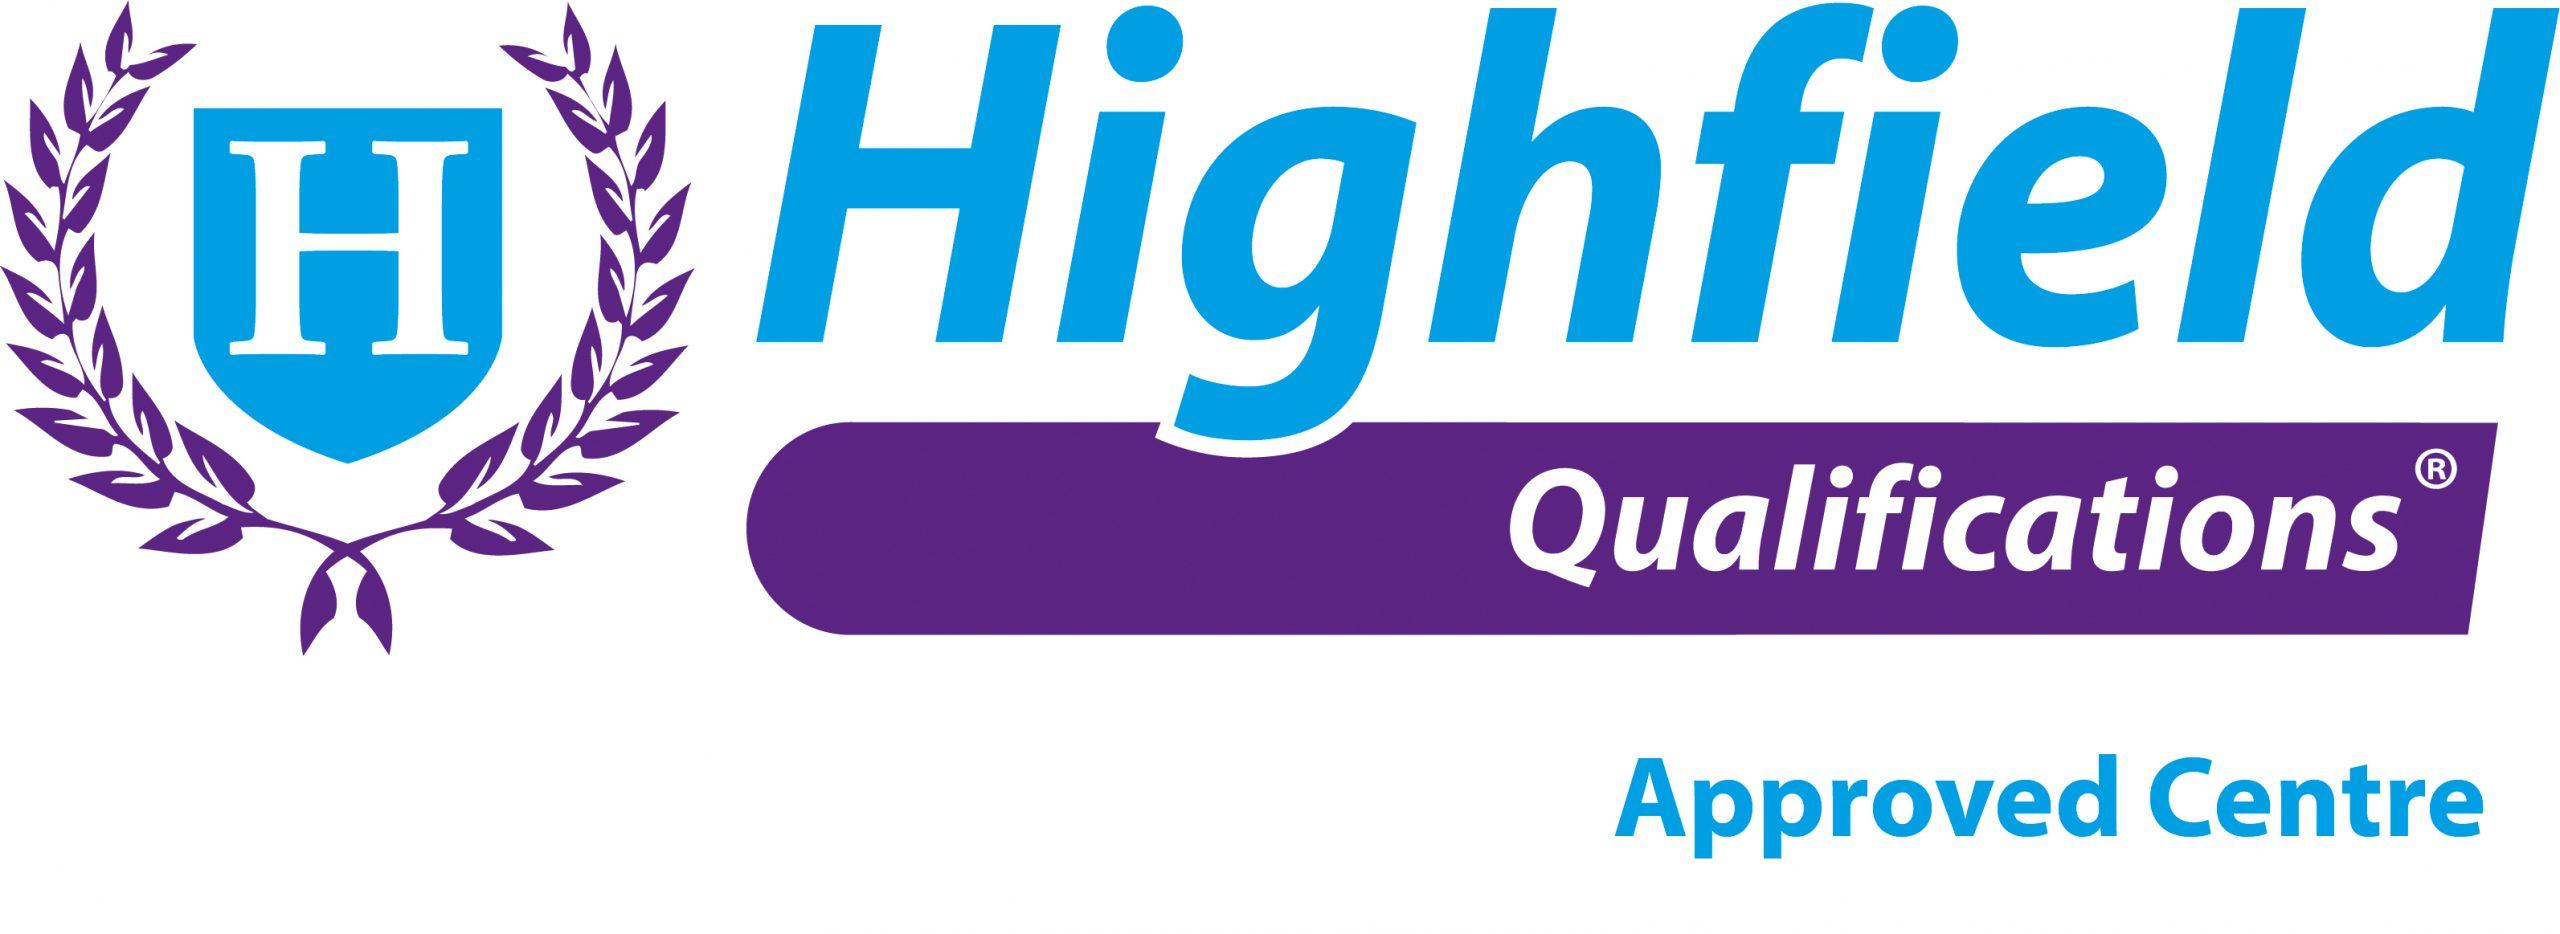 Highfield Qualifications